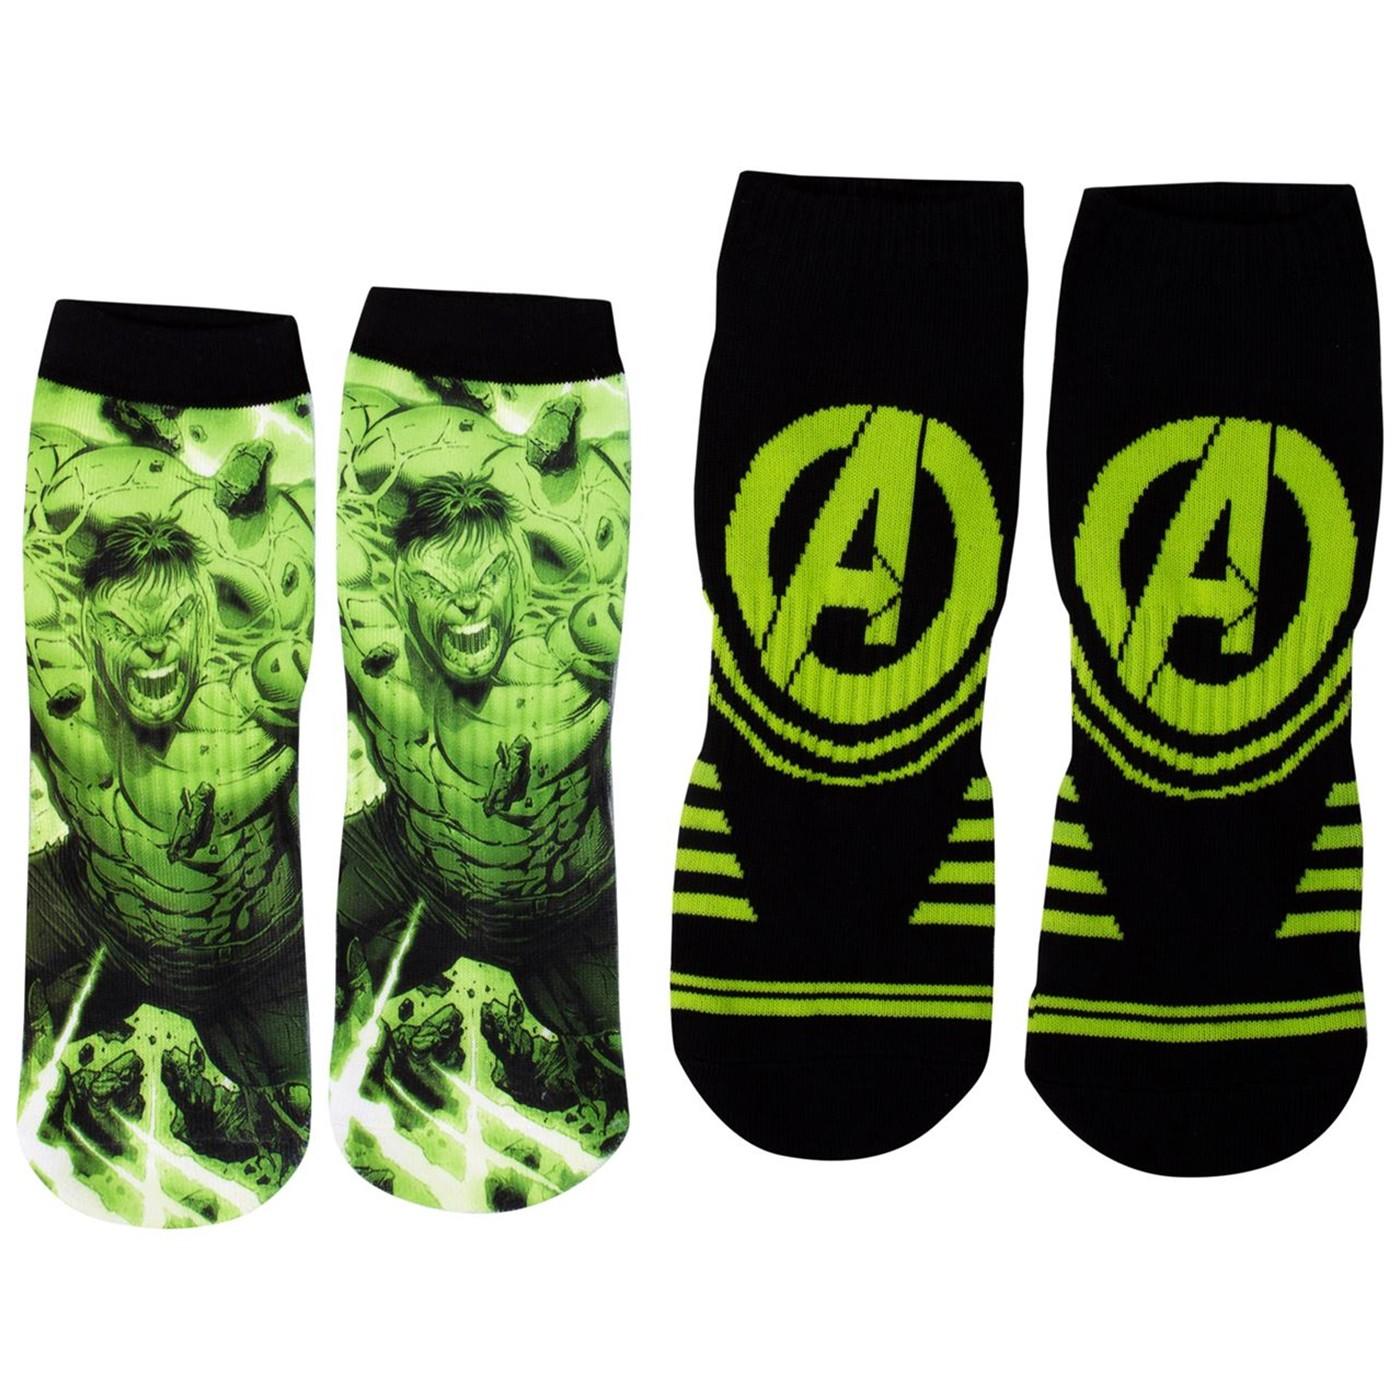 Incredible Hulk Two Pair No-Show Athletic Socks